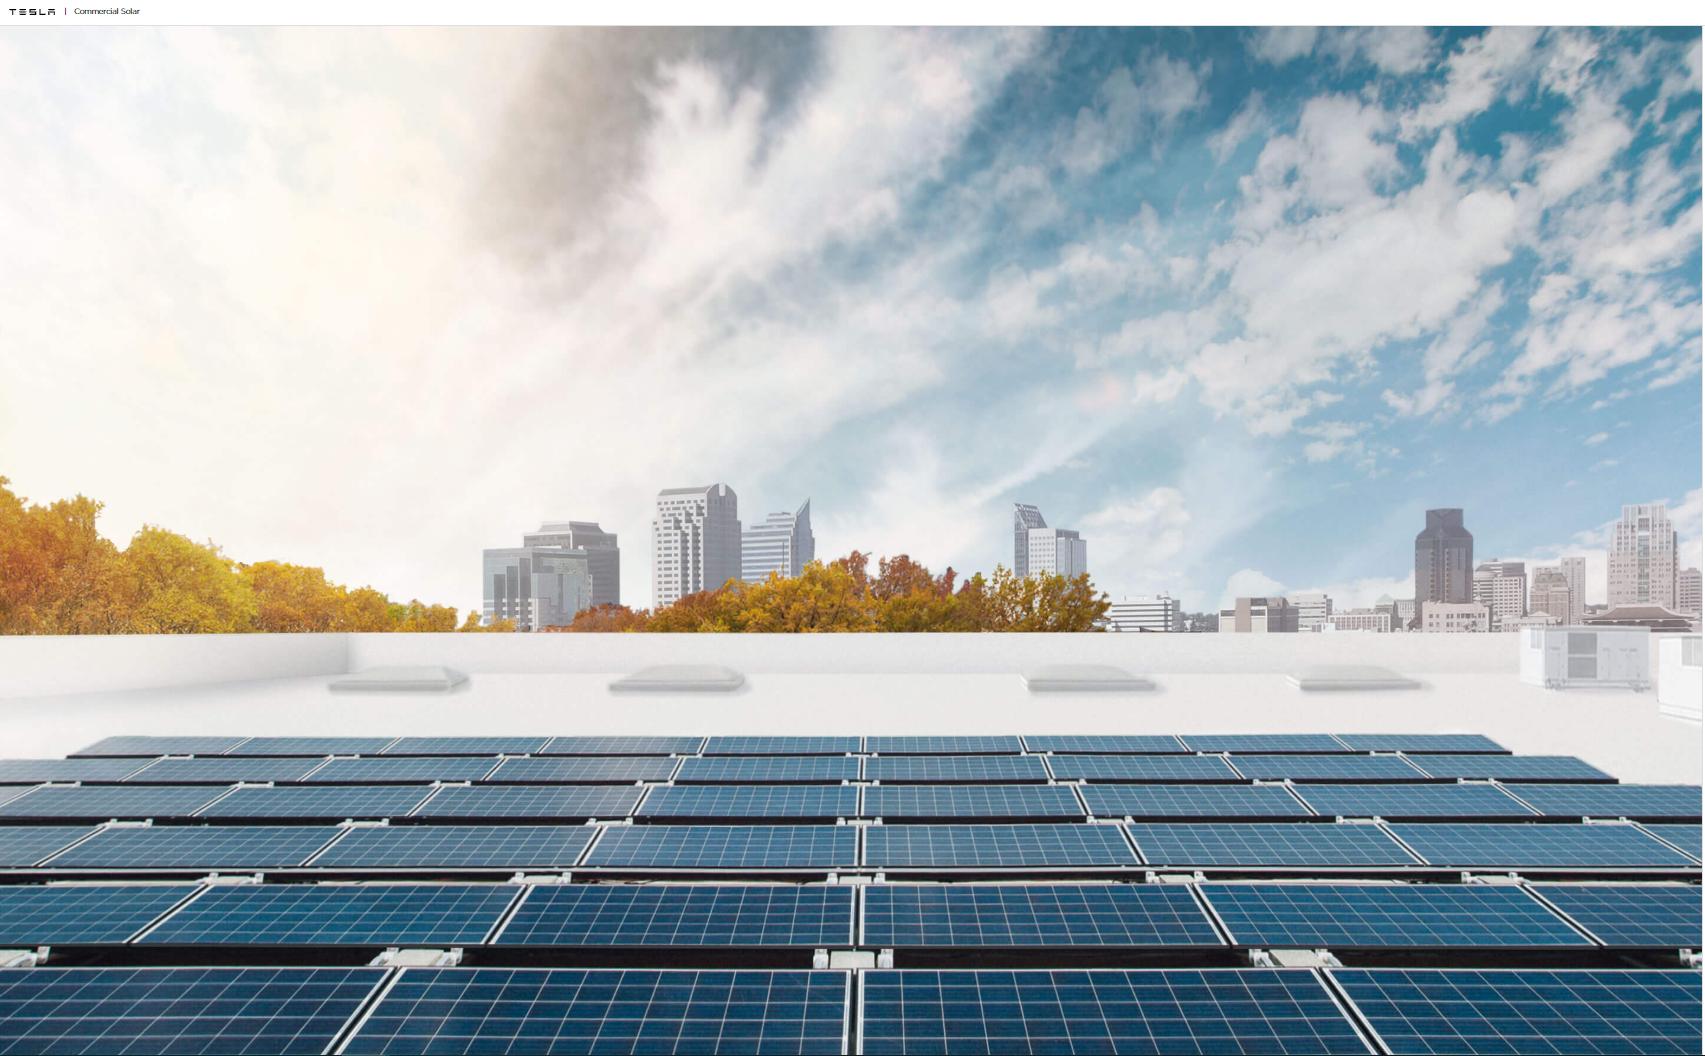 Tesla commercial solar